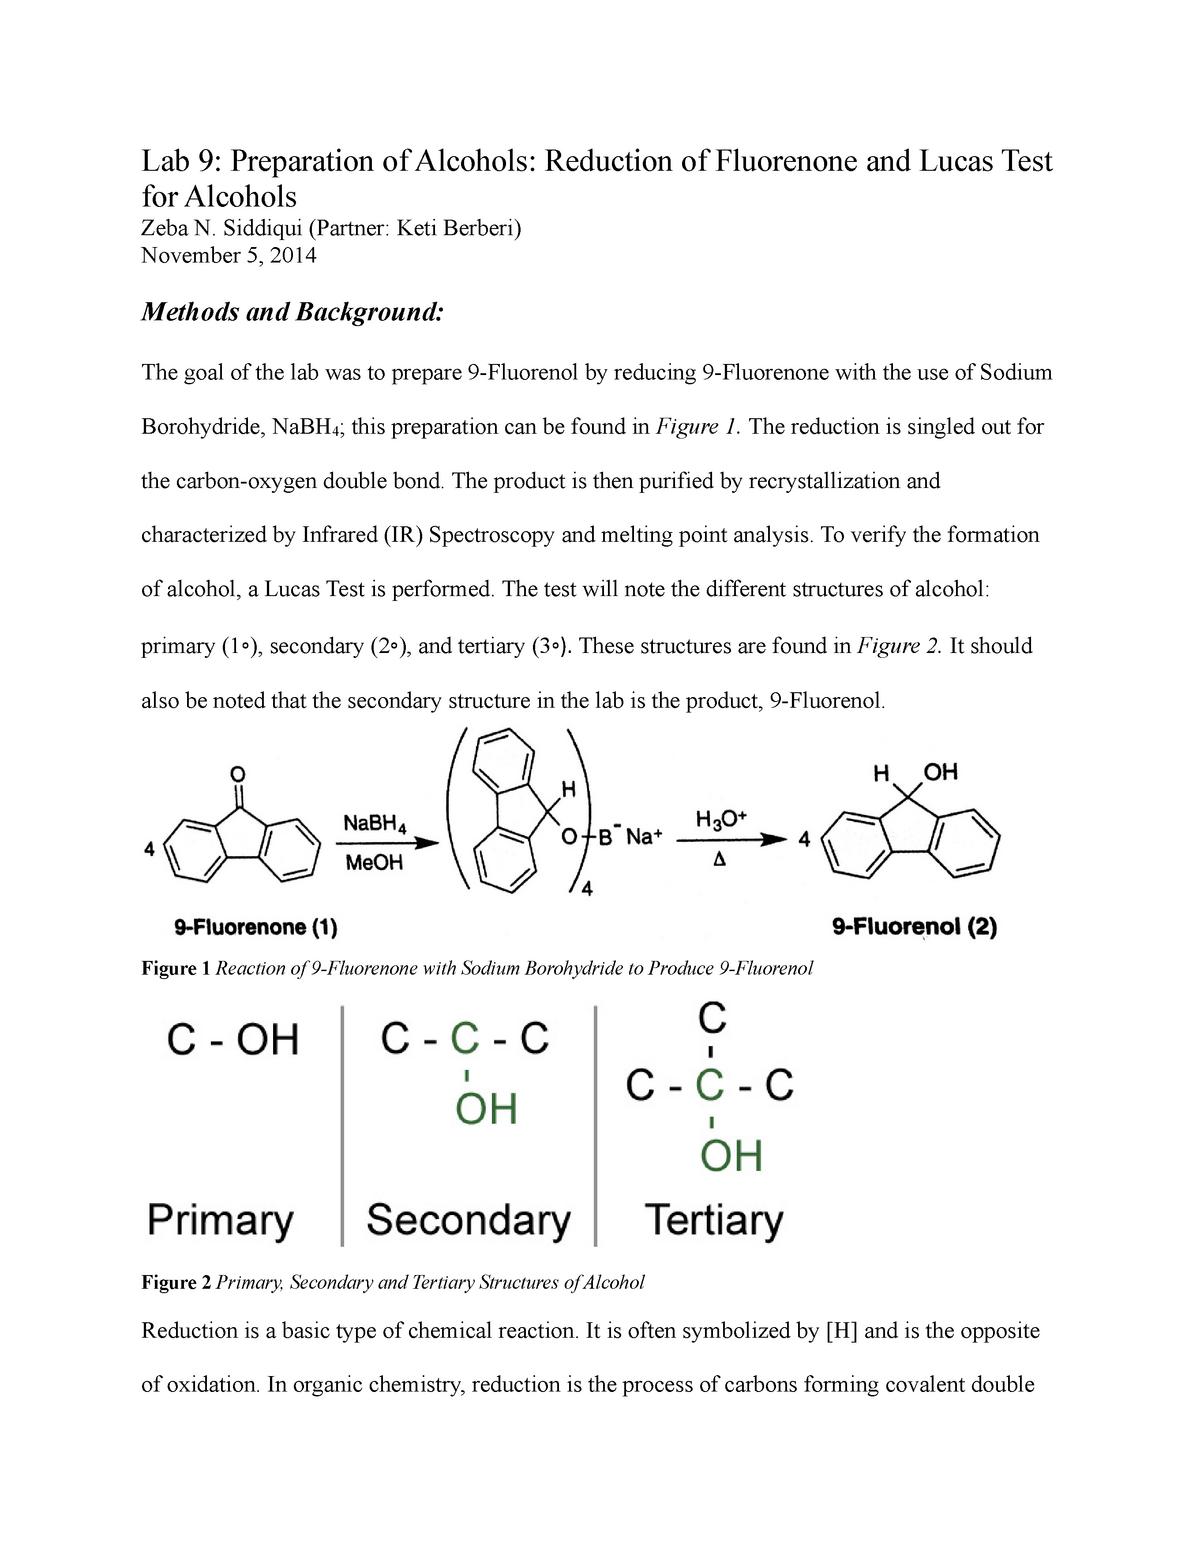 Lab Report 9 - Lecture notes 9 0 - CHEM 233 - UIC - StuDocu